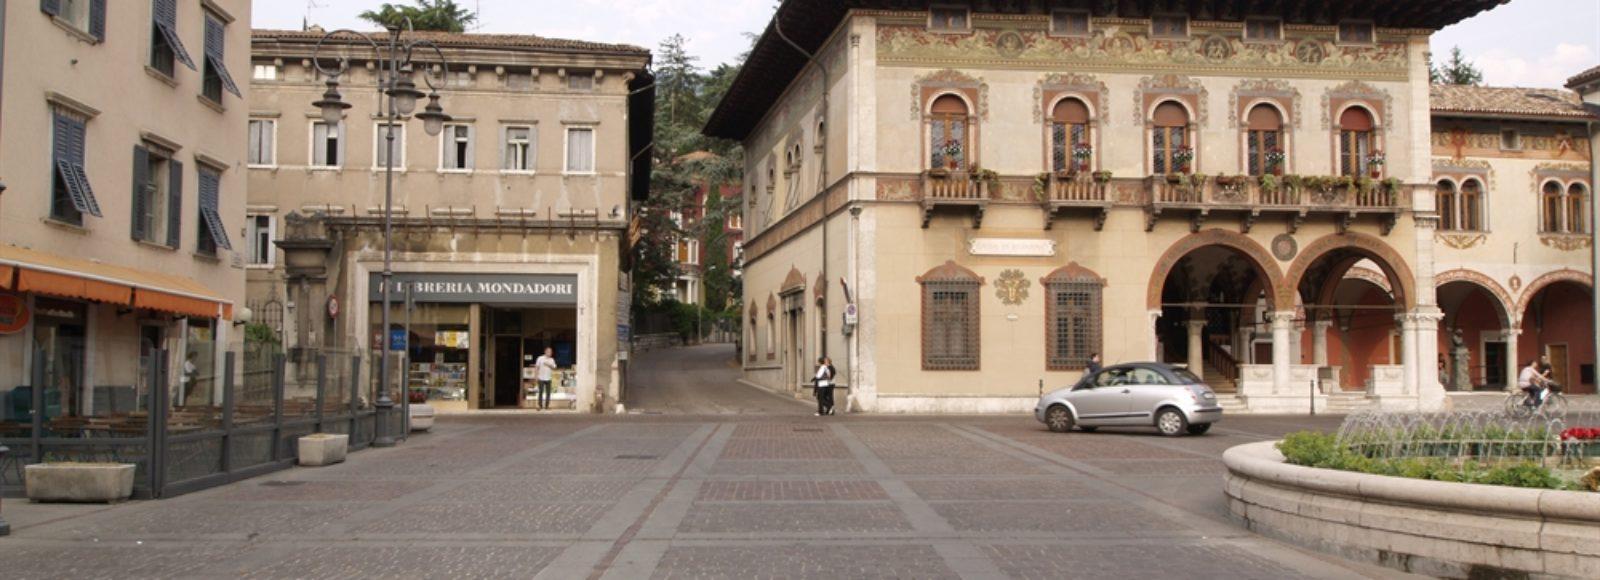 Rovereto - Piazza Rosmini